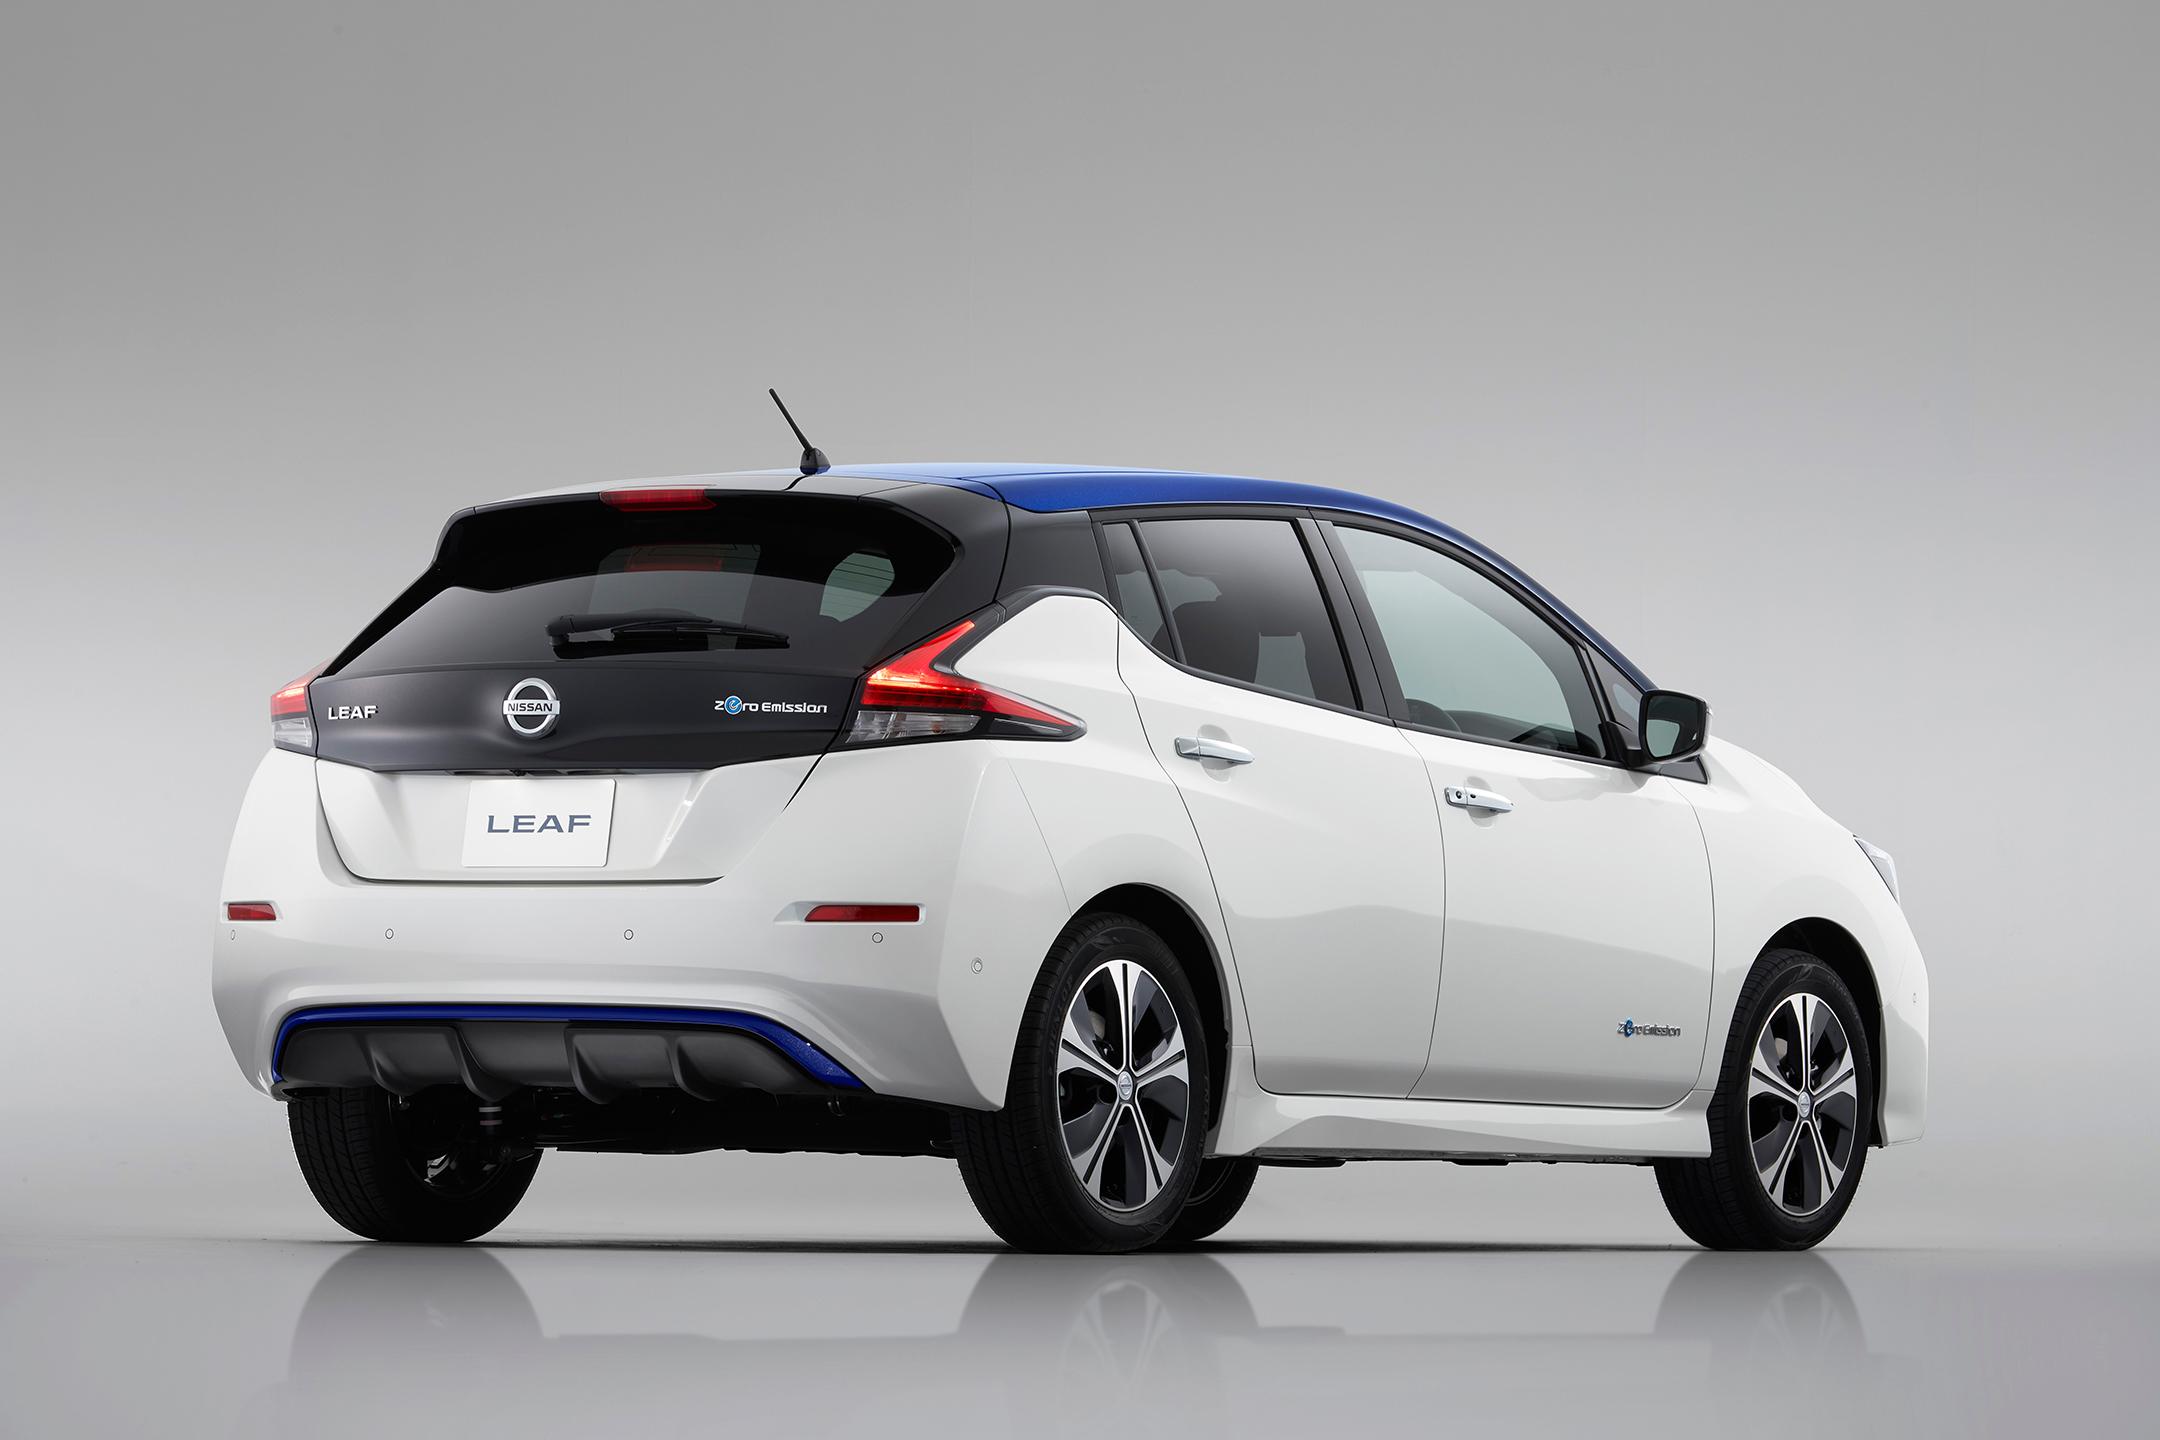 Nissan LEAF 2.0 - 2017 - rear side-face / profil arrière